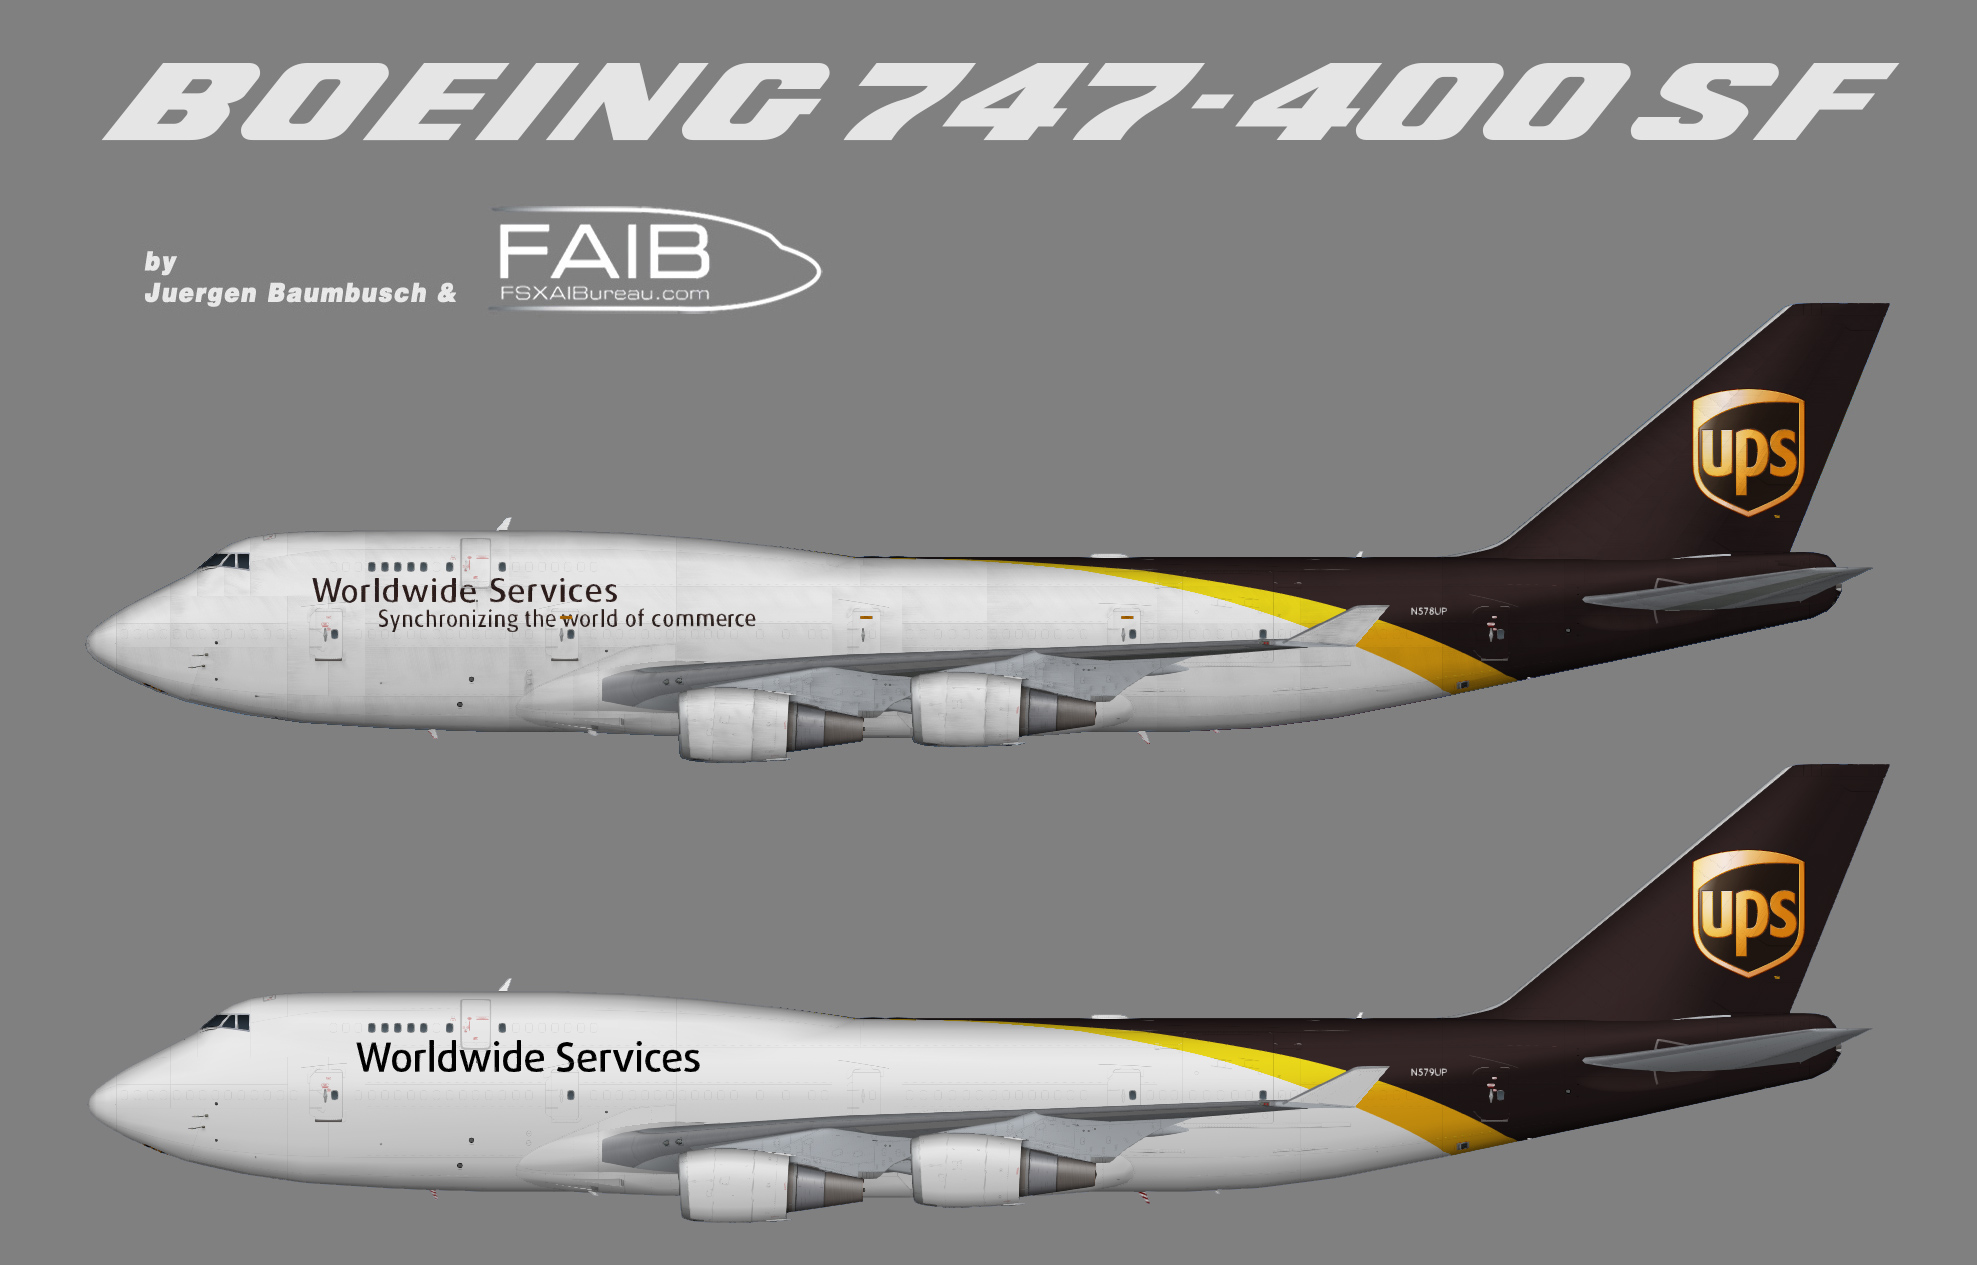 United Parcel Service Boeing 747-400(BCF)